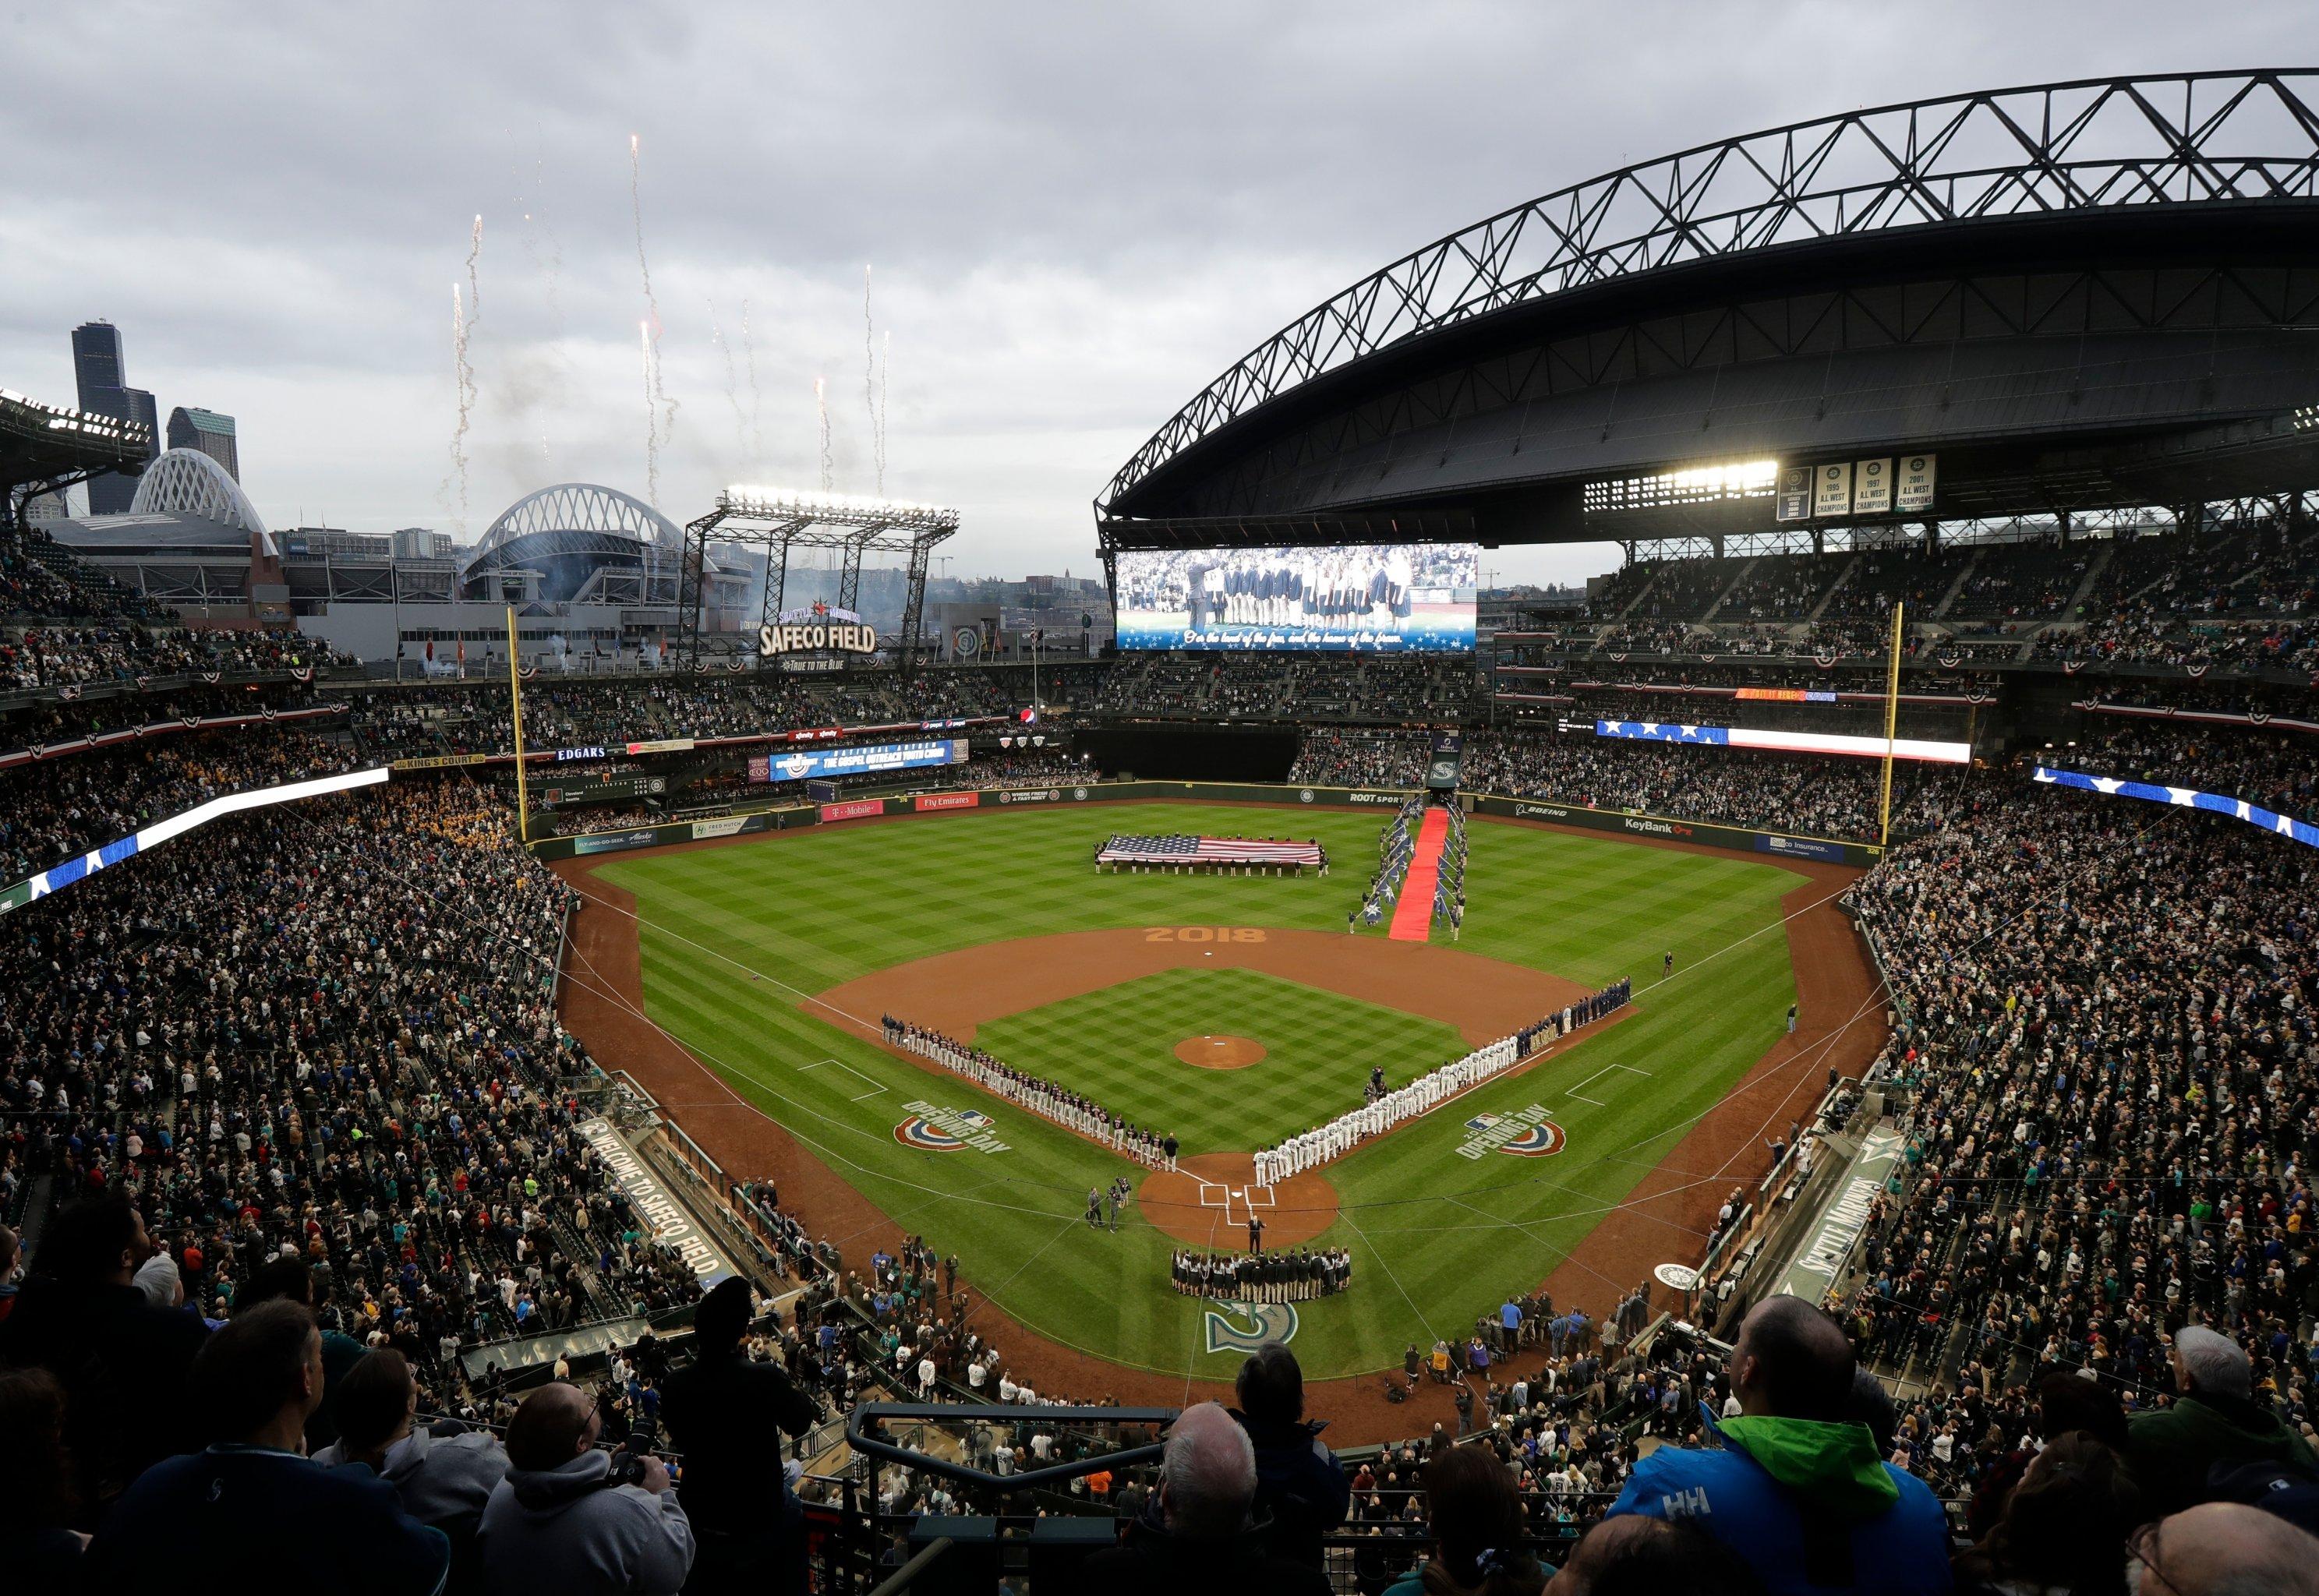 Ranking the 10 Best Major League Baseball Stadiums